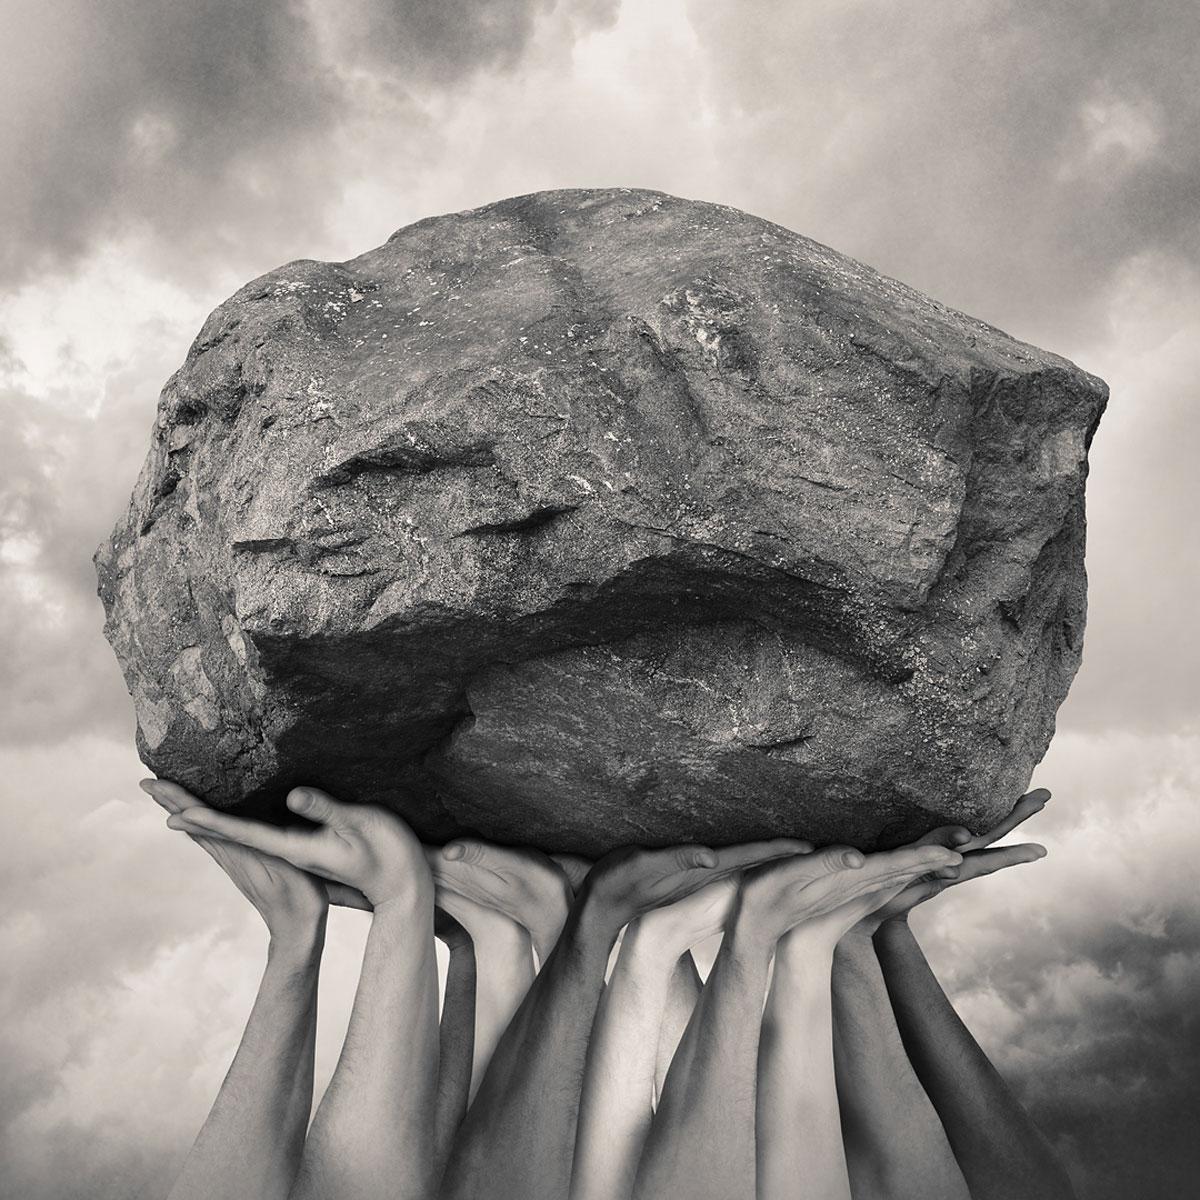 Tommy Ingberg image of hands holding up large stone